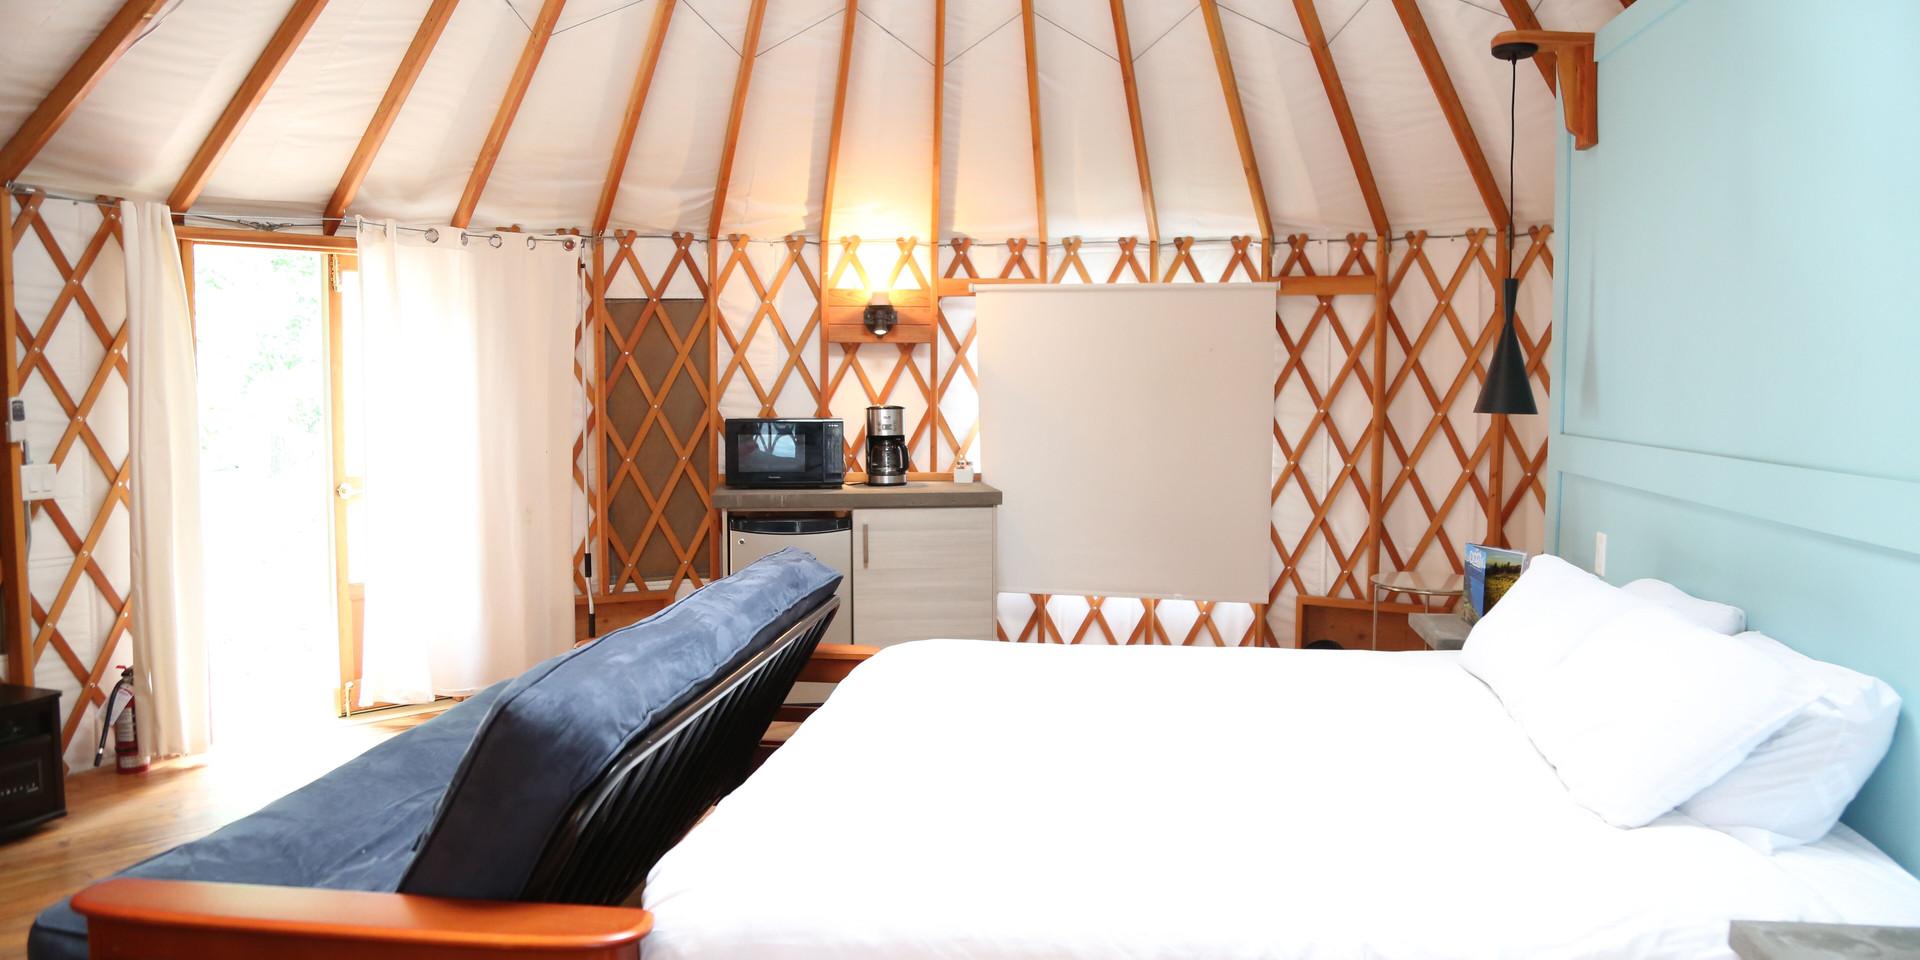 Yurt camping interior, hotel room